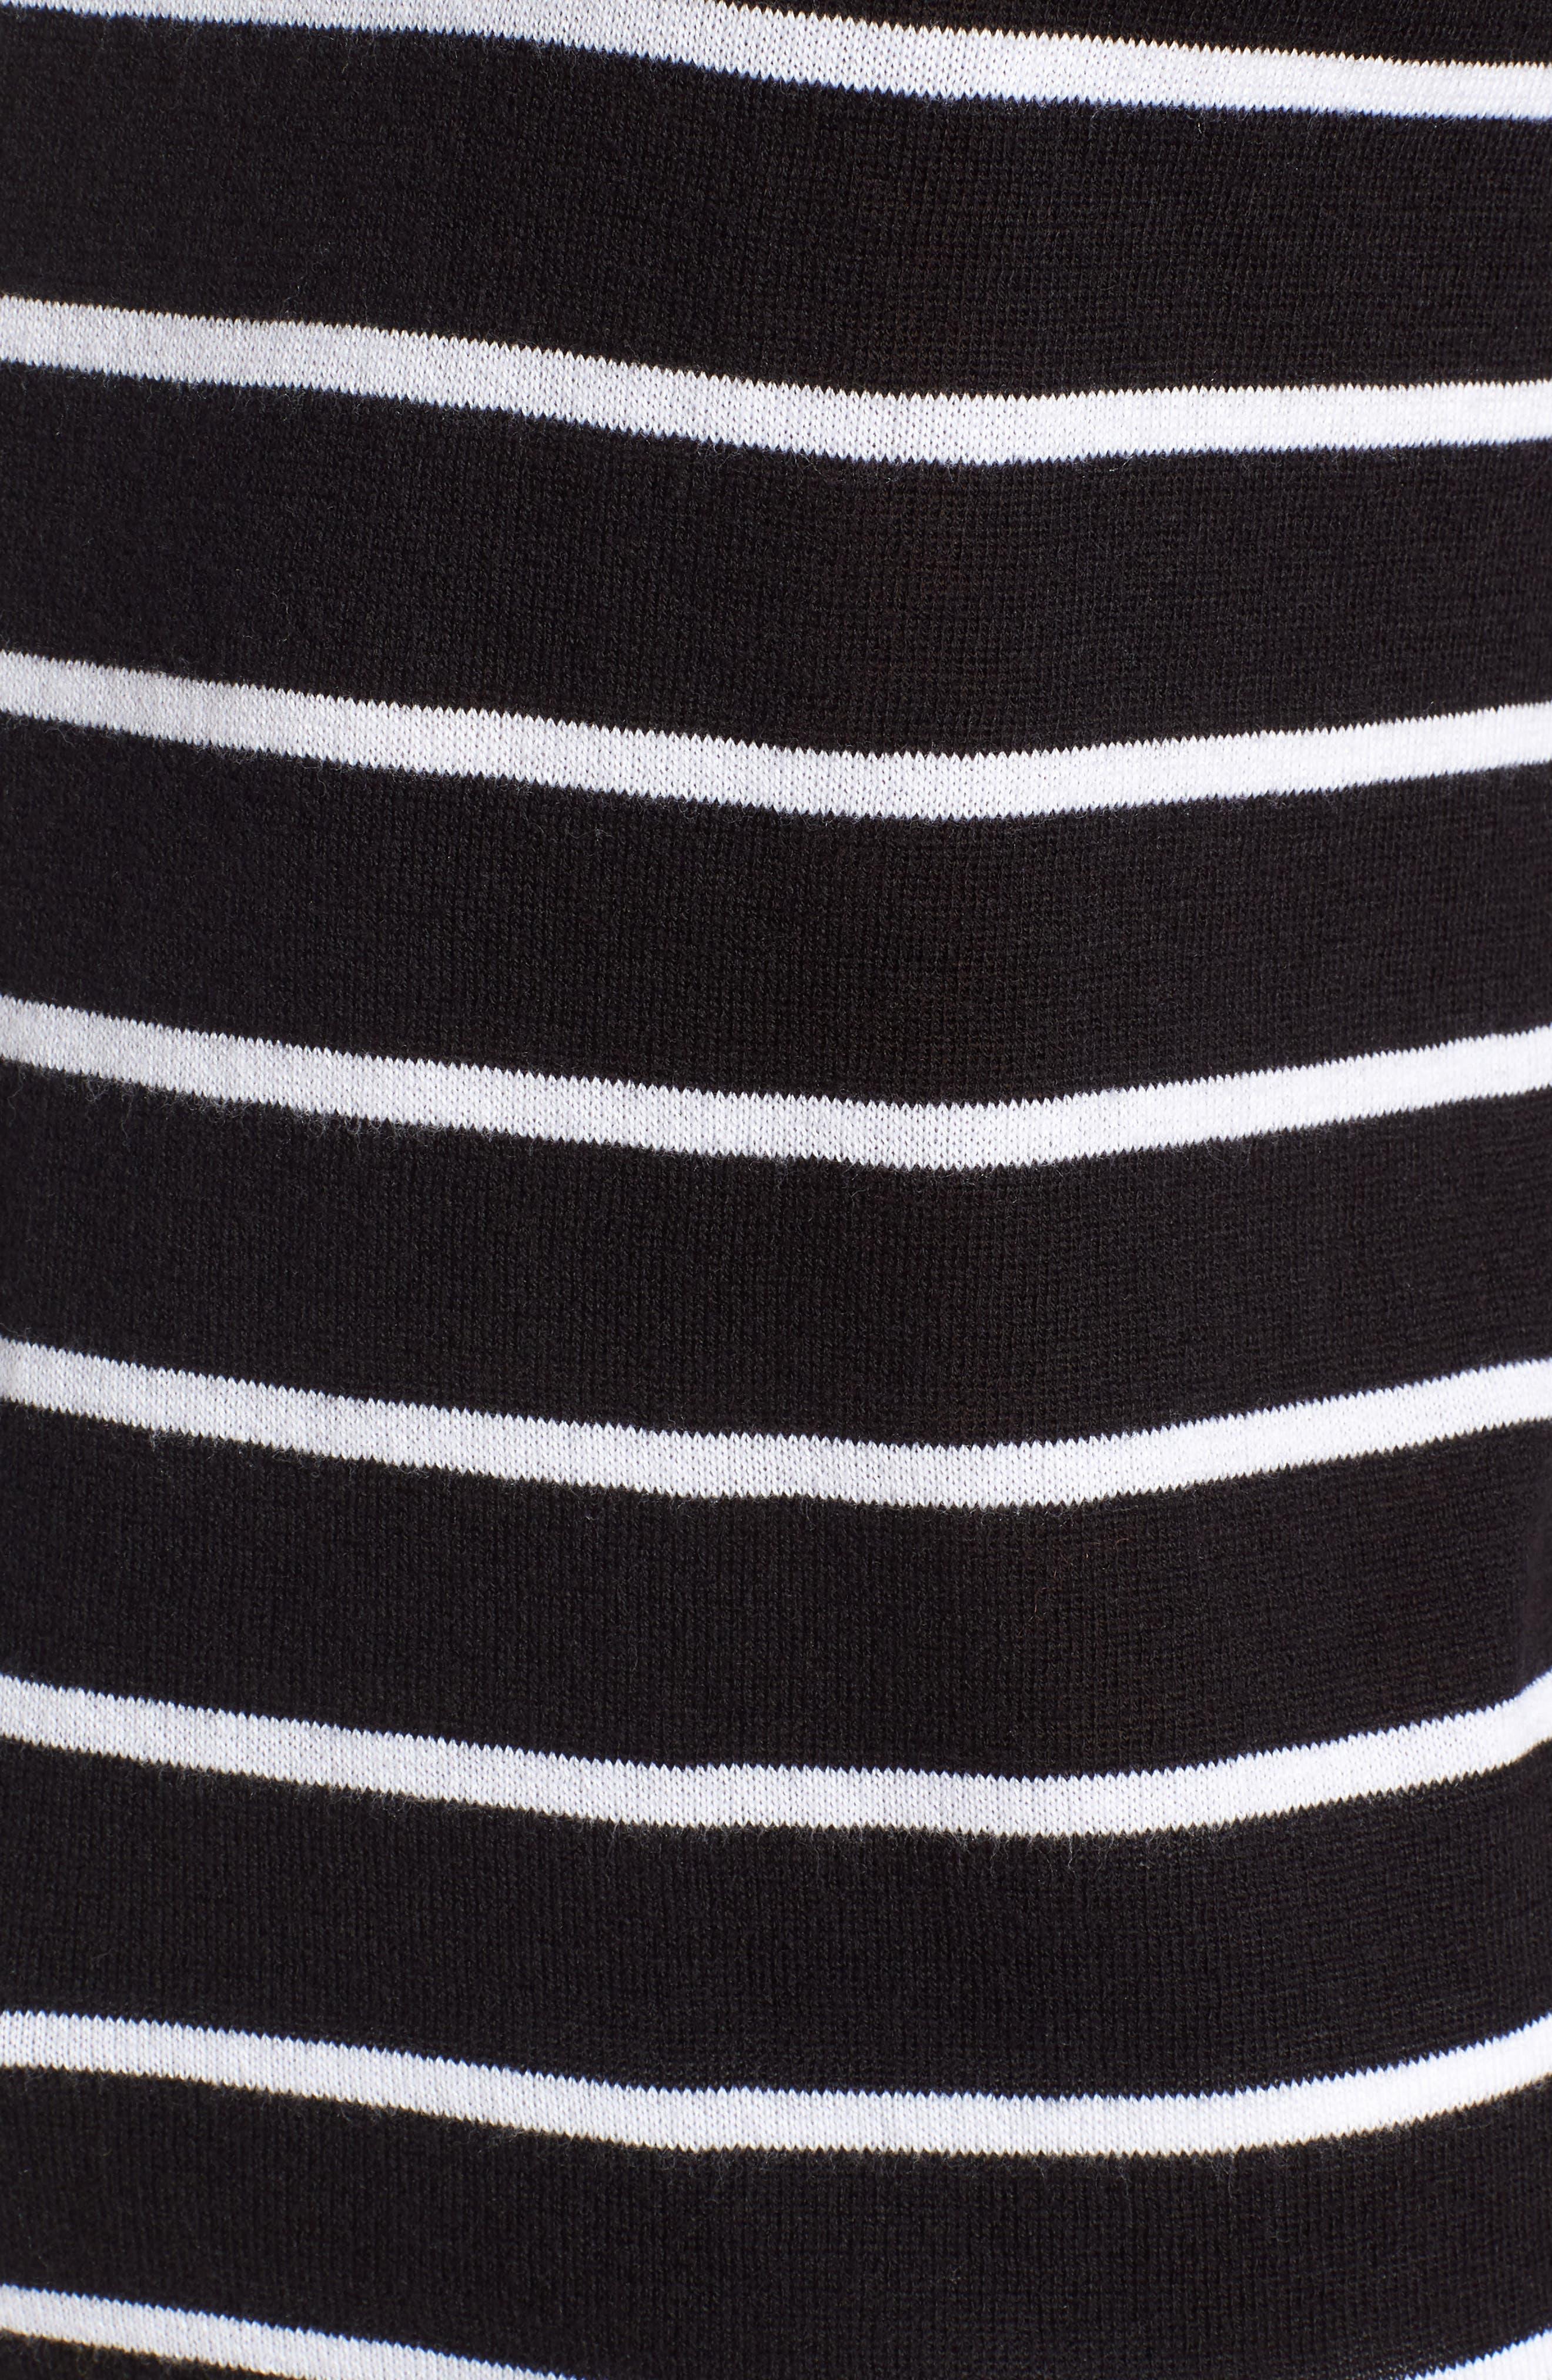 Cotton Blend Pullover,                             Alternate thumbnail 5, color,                             006